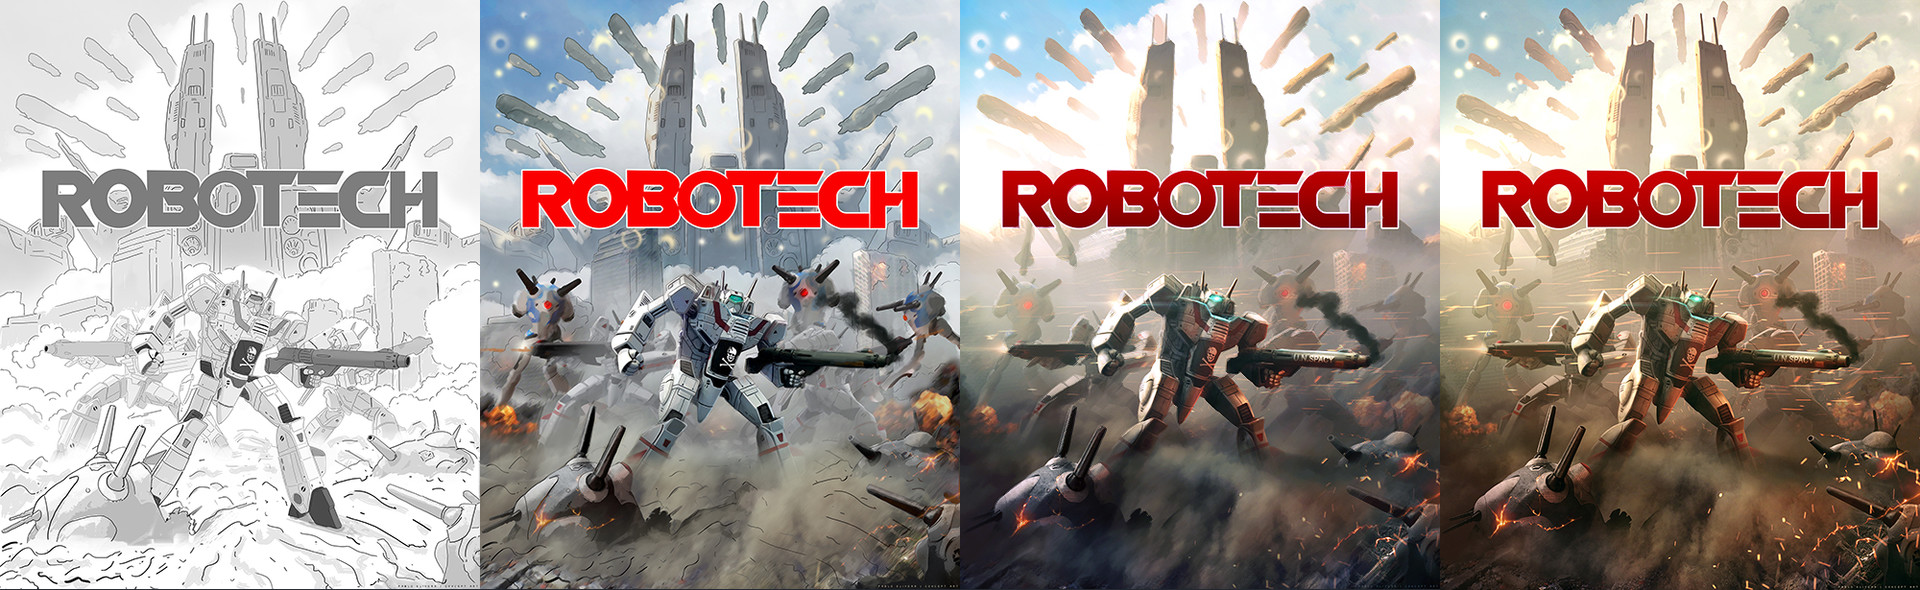 Pablo olivera robotech illustration process